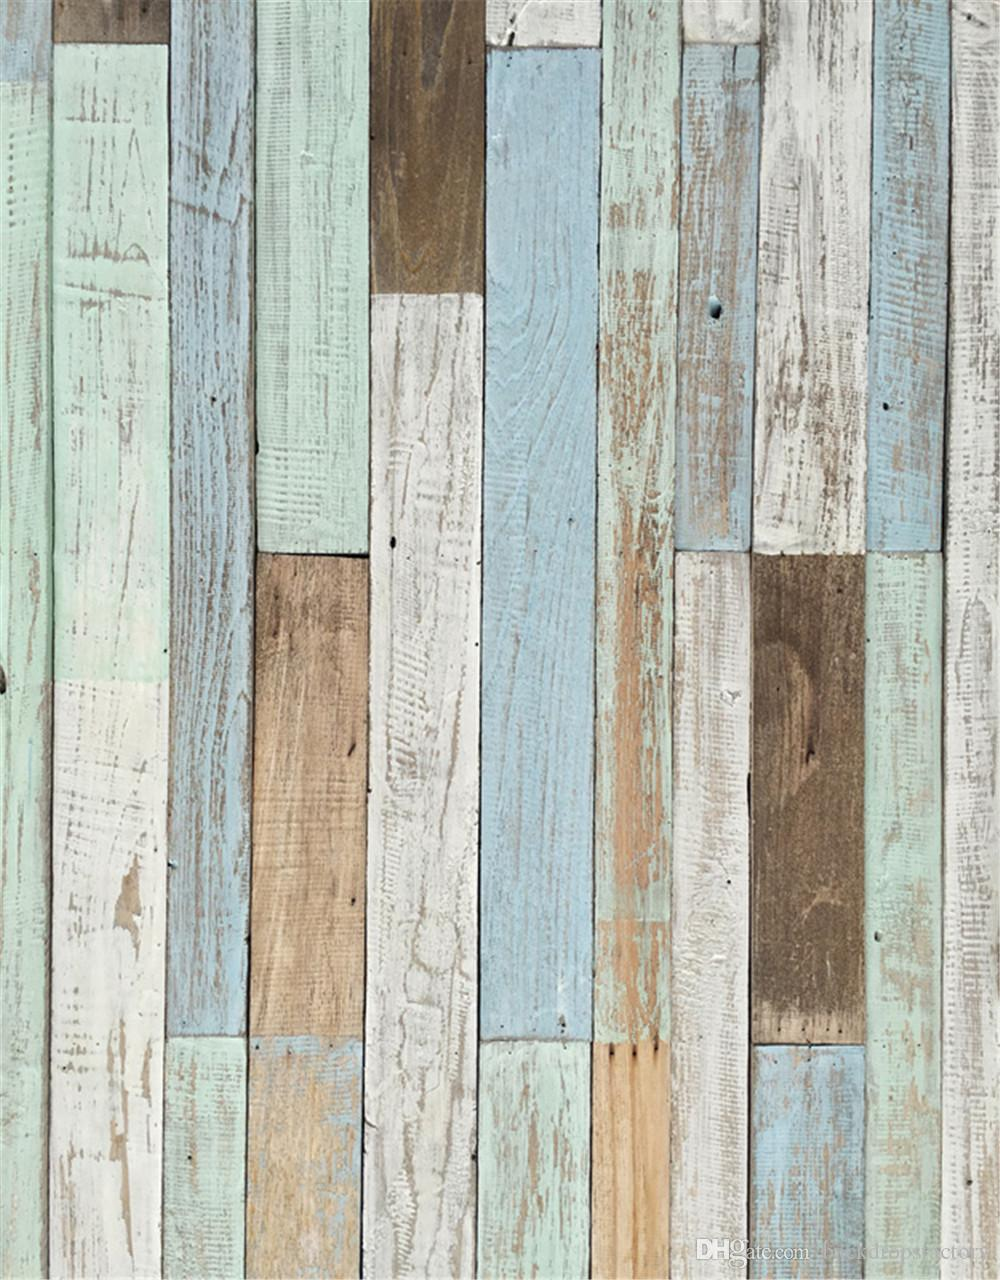 Digital Painted Wood Planks Photography Fondali Vinile Bambini Bambini Studio Ritratto Photo Booth Sfondi per Neonato